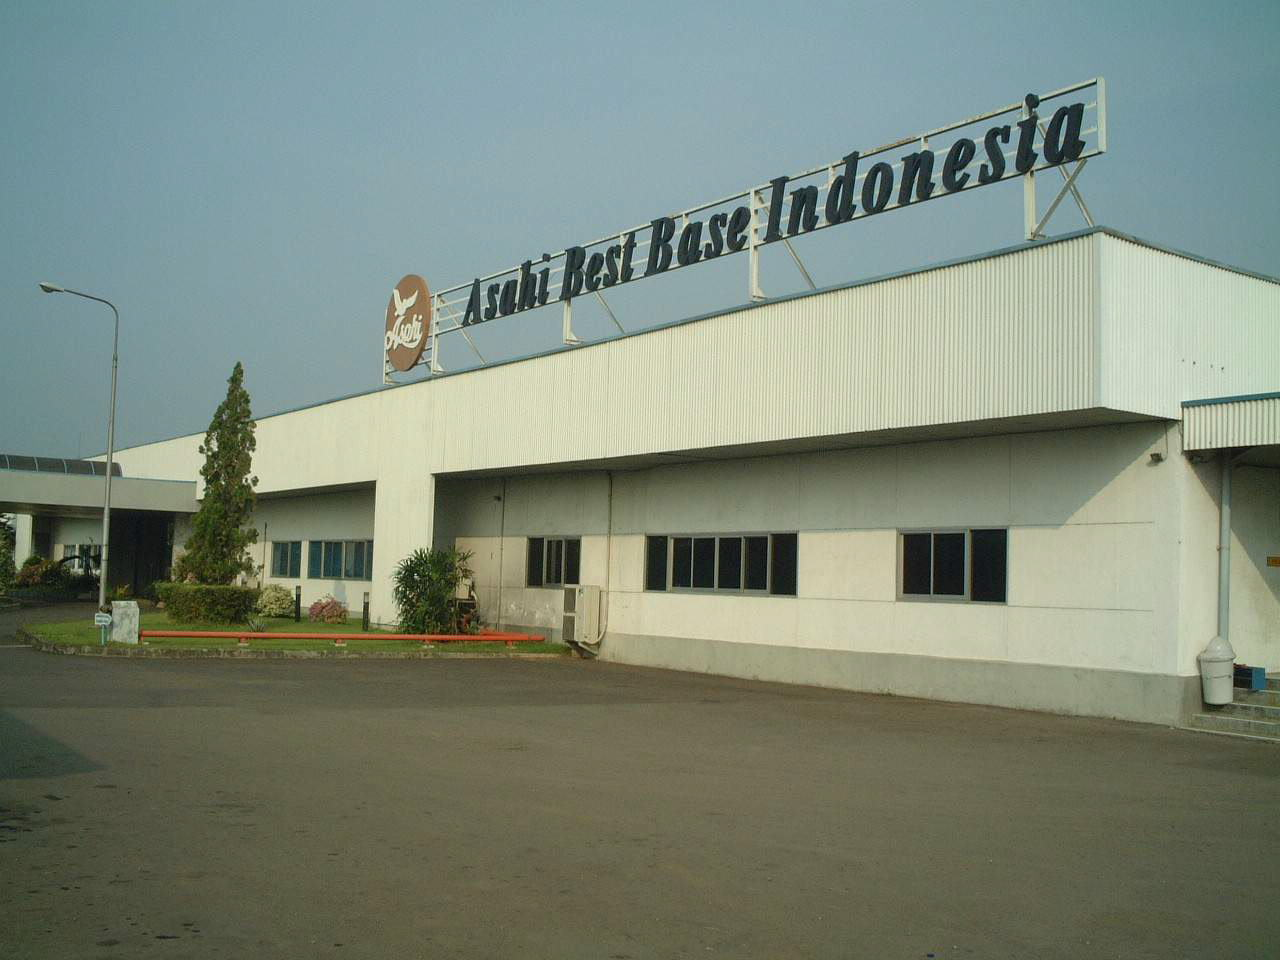 Info Loker Pabrik Di Karawang Kiic Lowongan Kerja Pt Nestle Indonesia Loker Cpns Bumn 1280 X 960 Jpeg 111kb Lowongan Kerja Pt Asahi Best Indonesia Bekasi